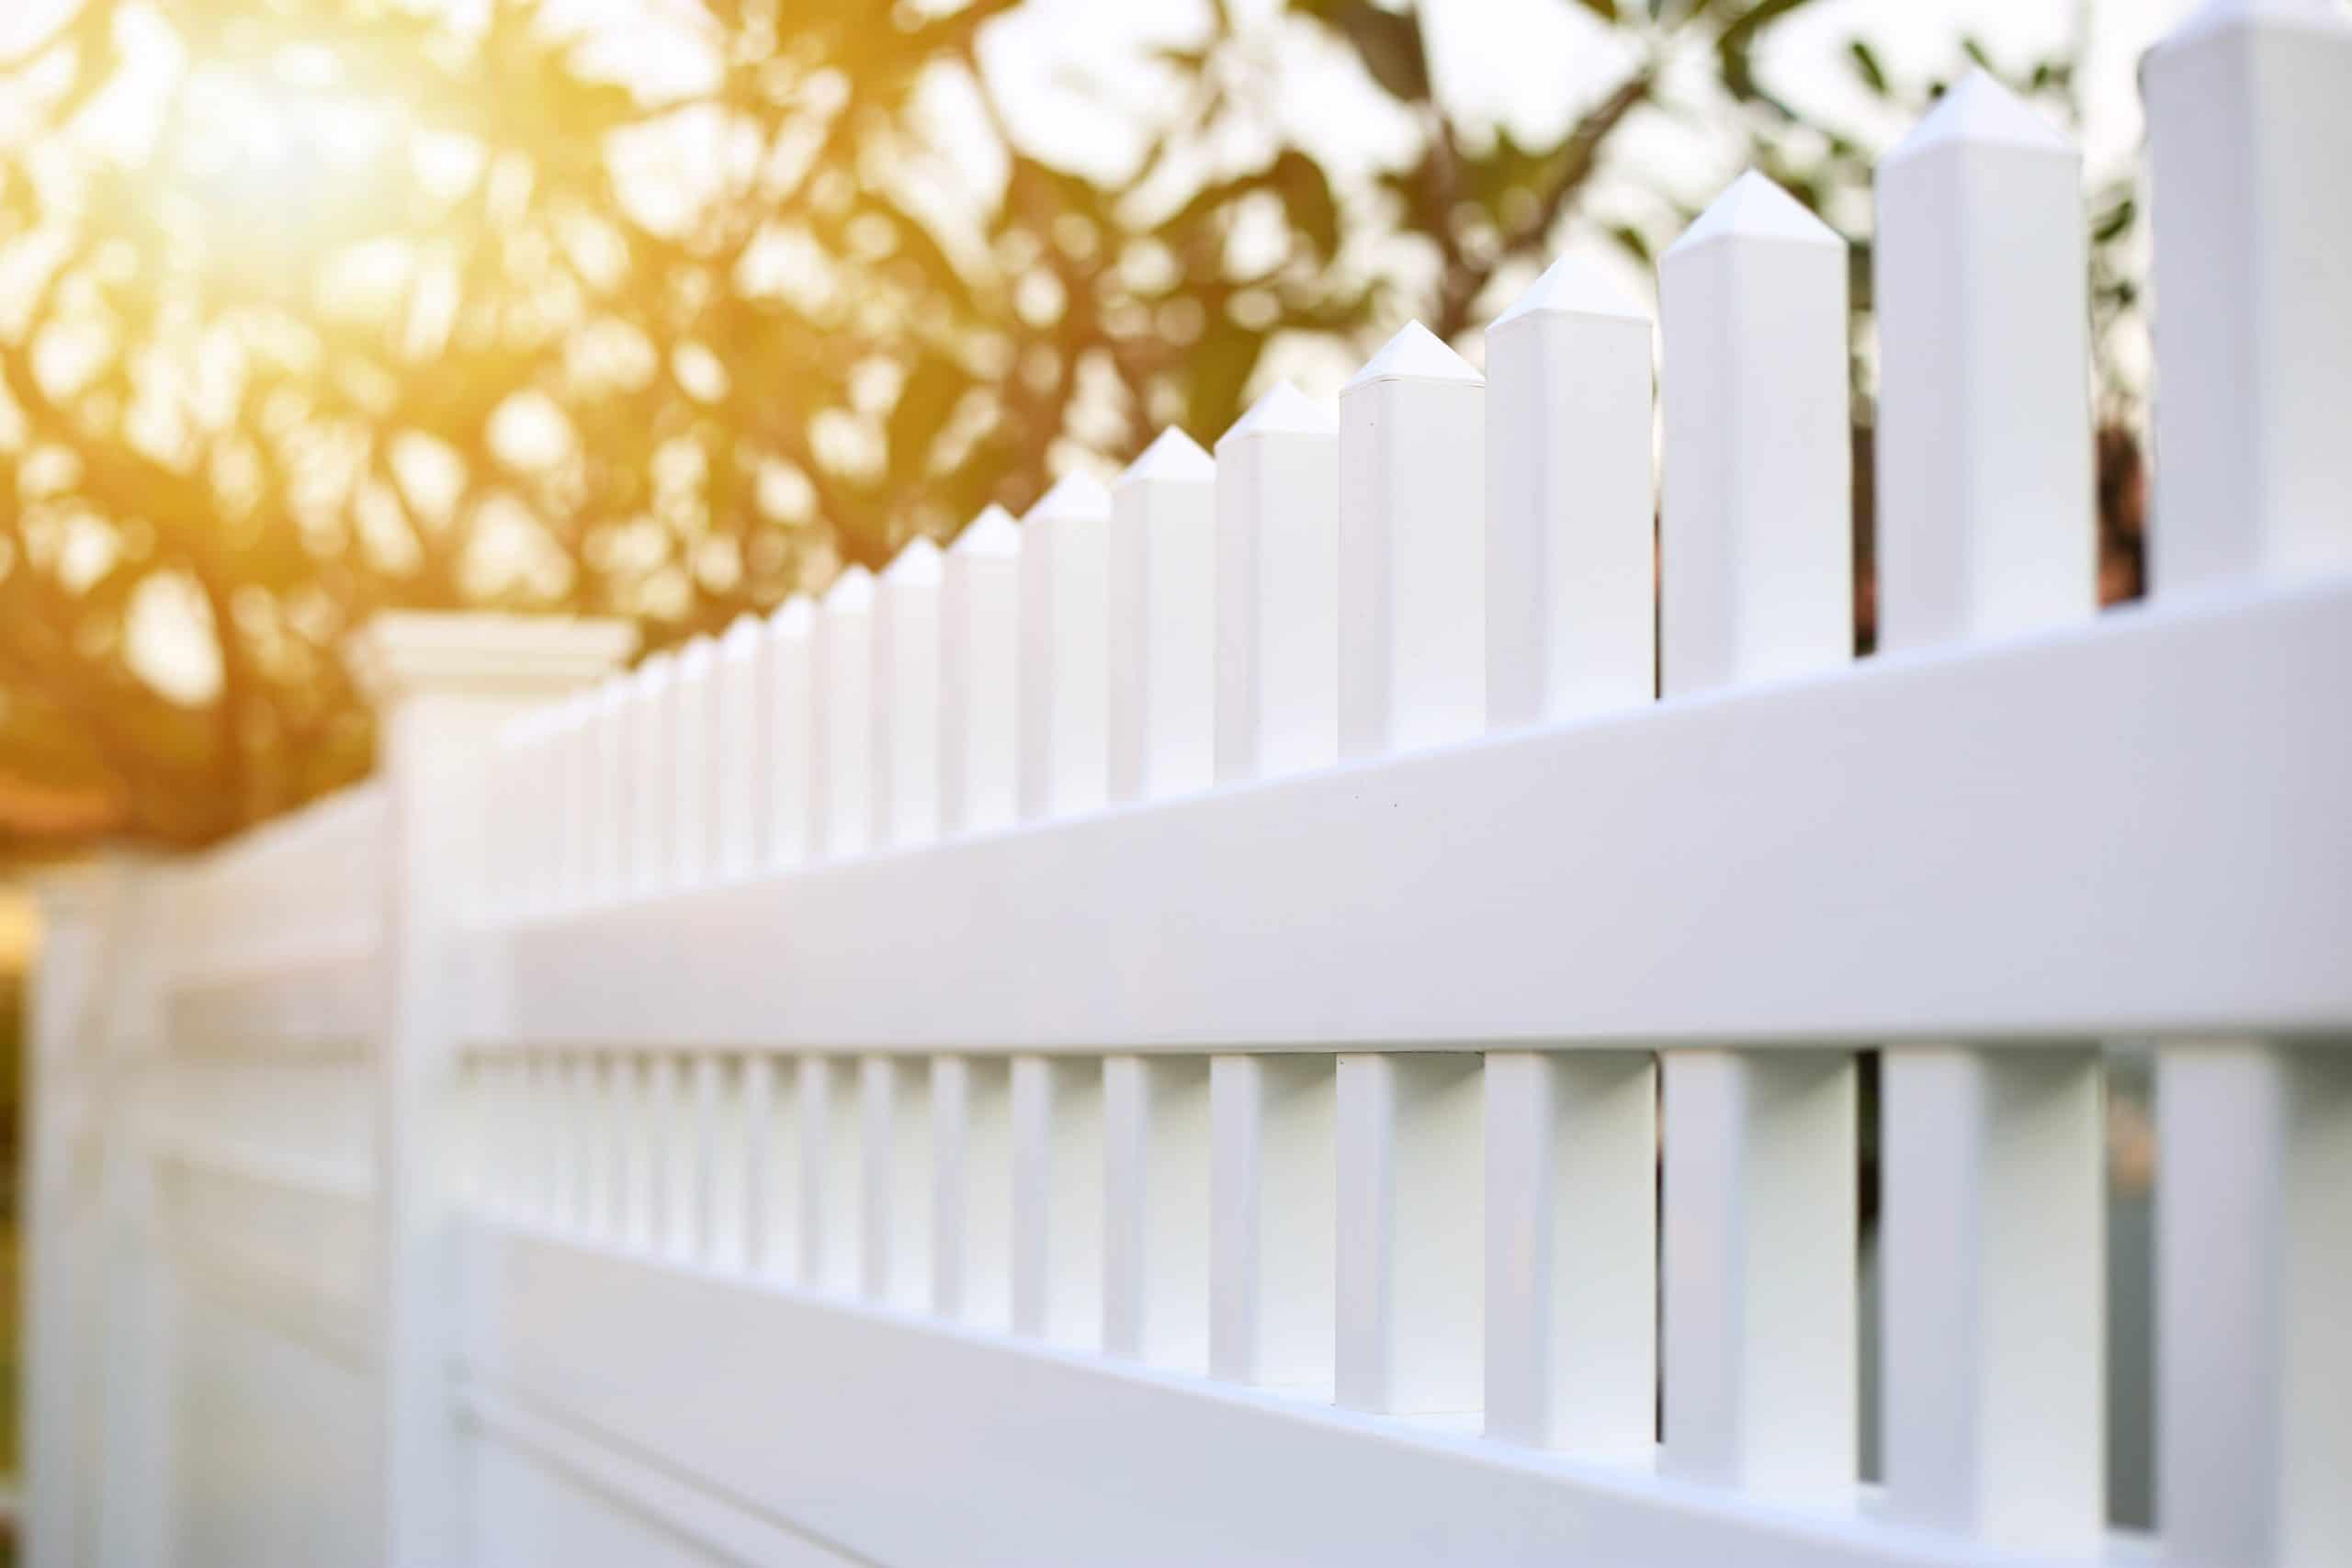 white fence boundary dispute